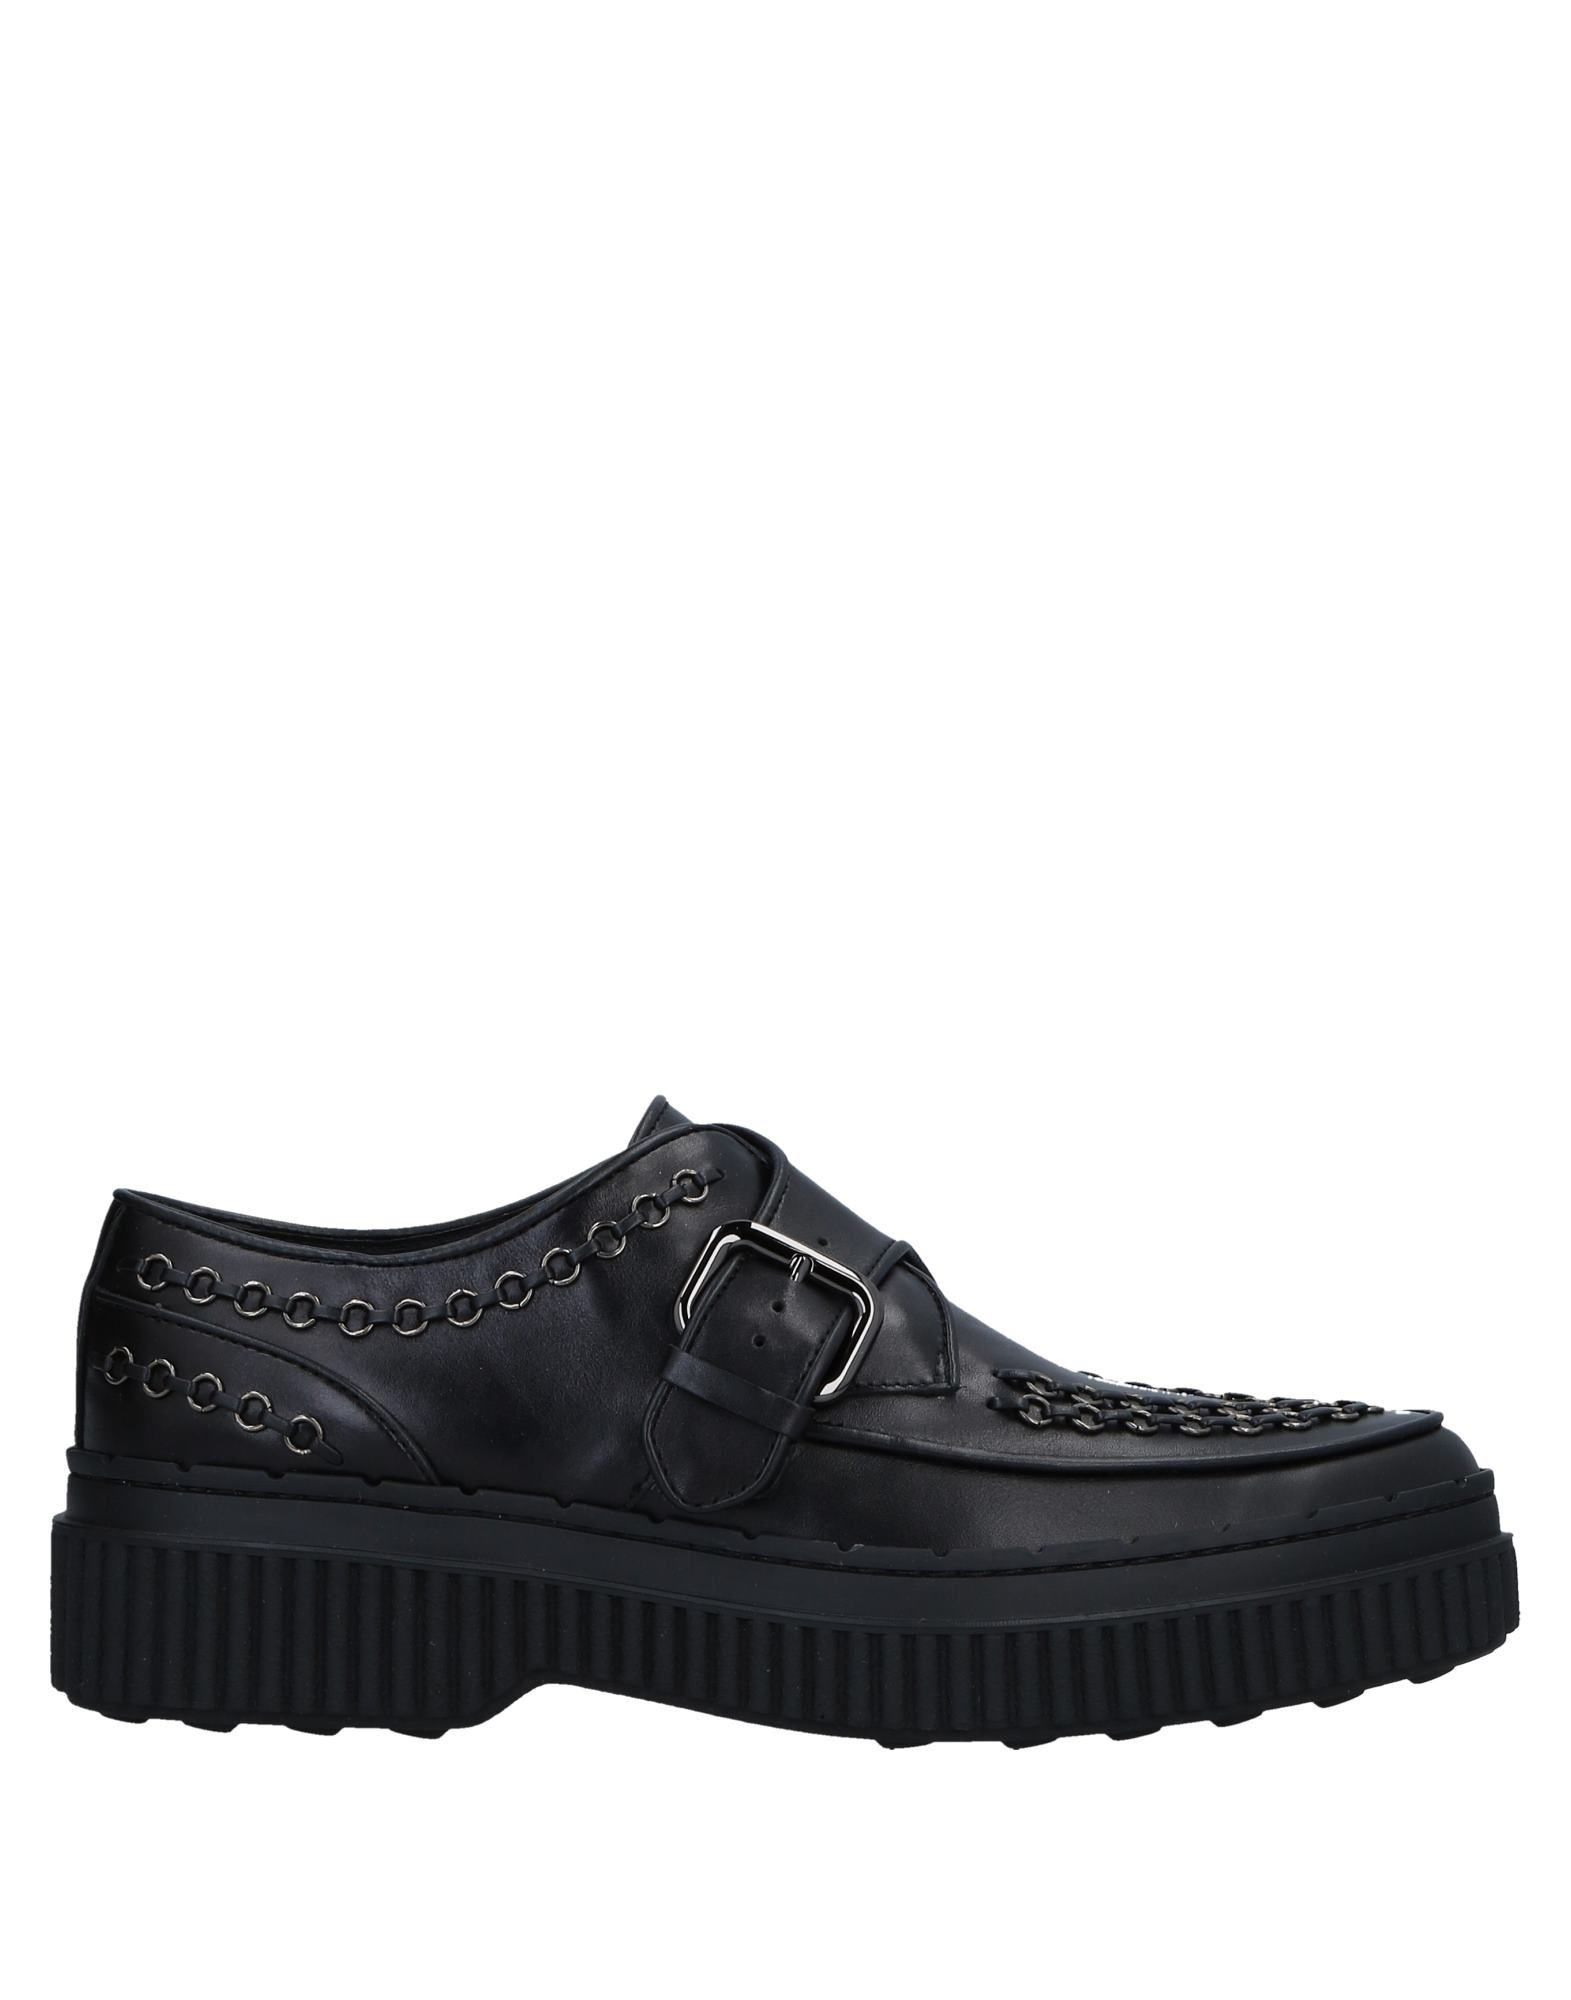 Tod's Mokassins Damen gut  11542304NIGünstige gut Damen aussehende Schuhe f87698